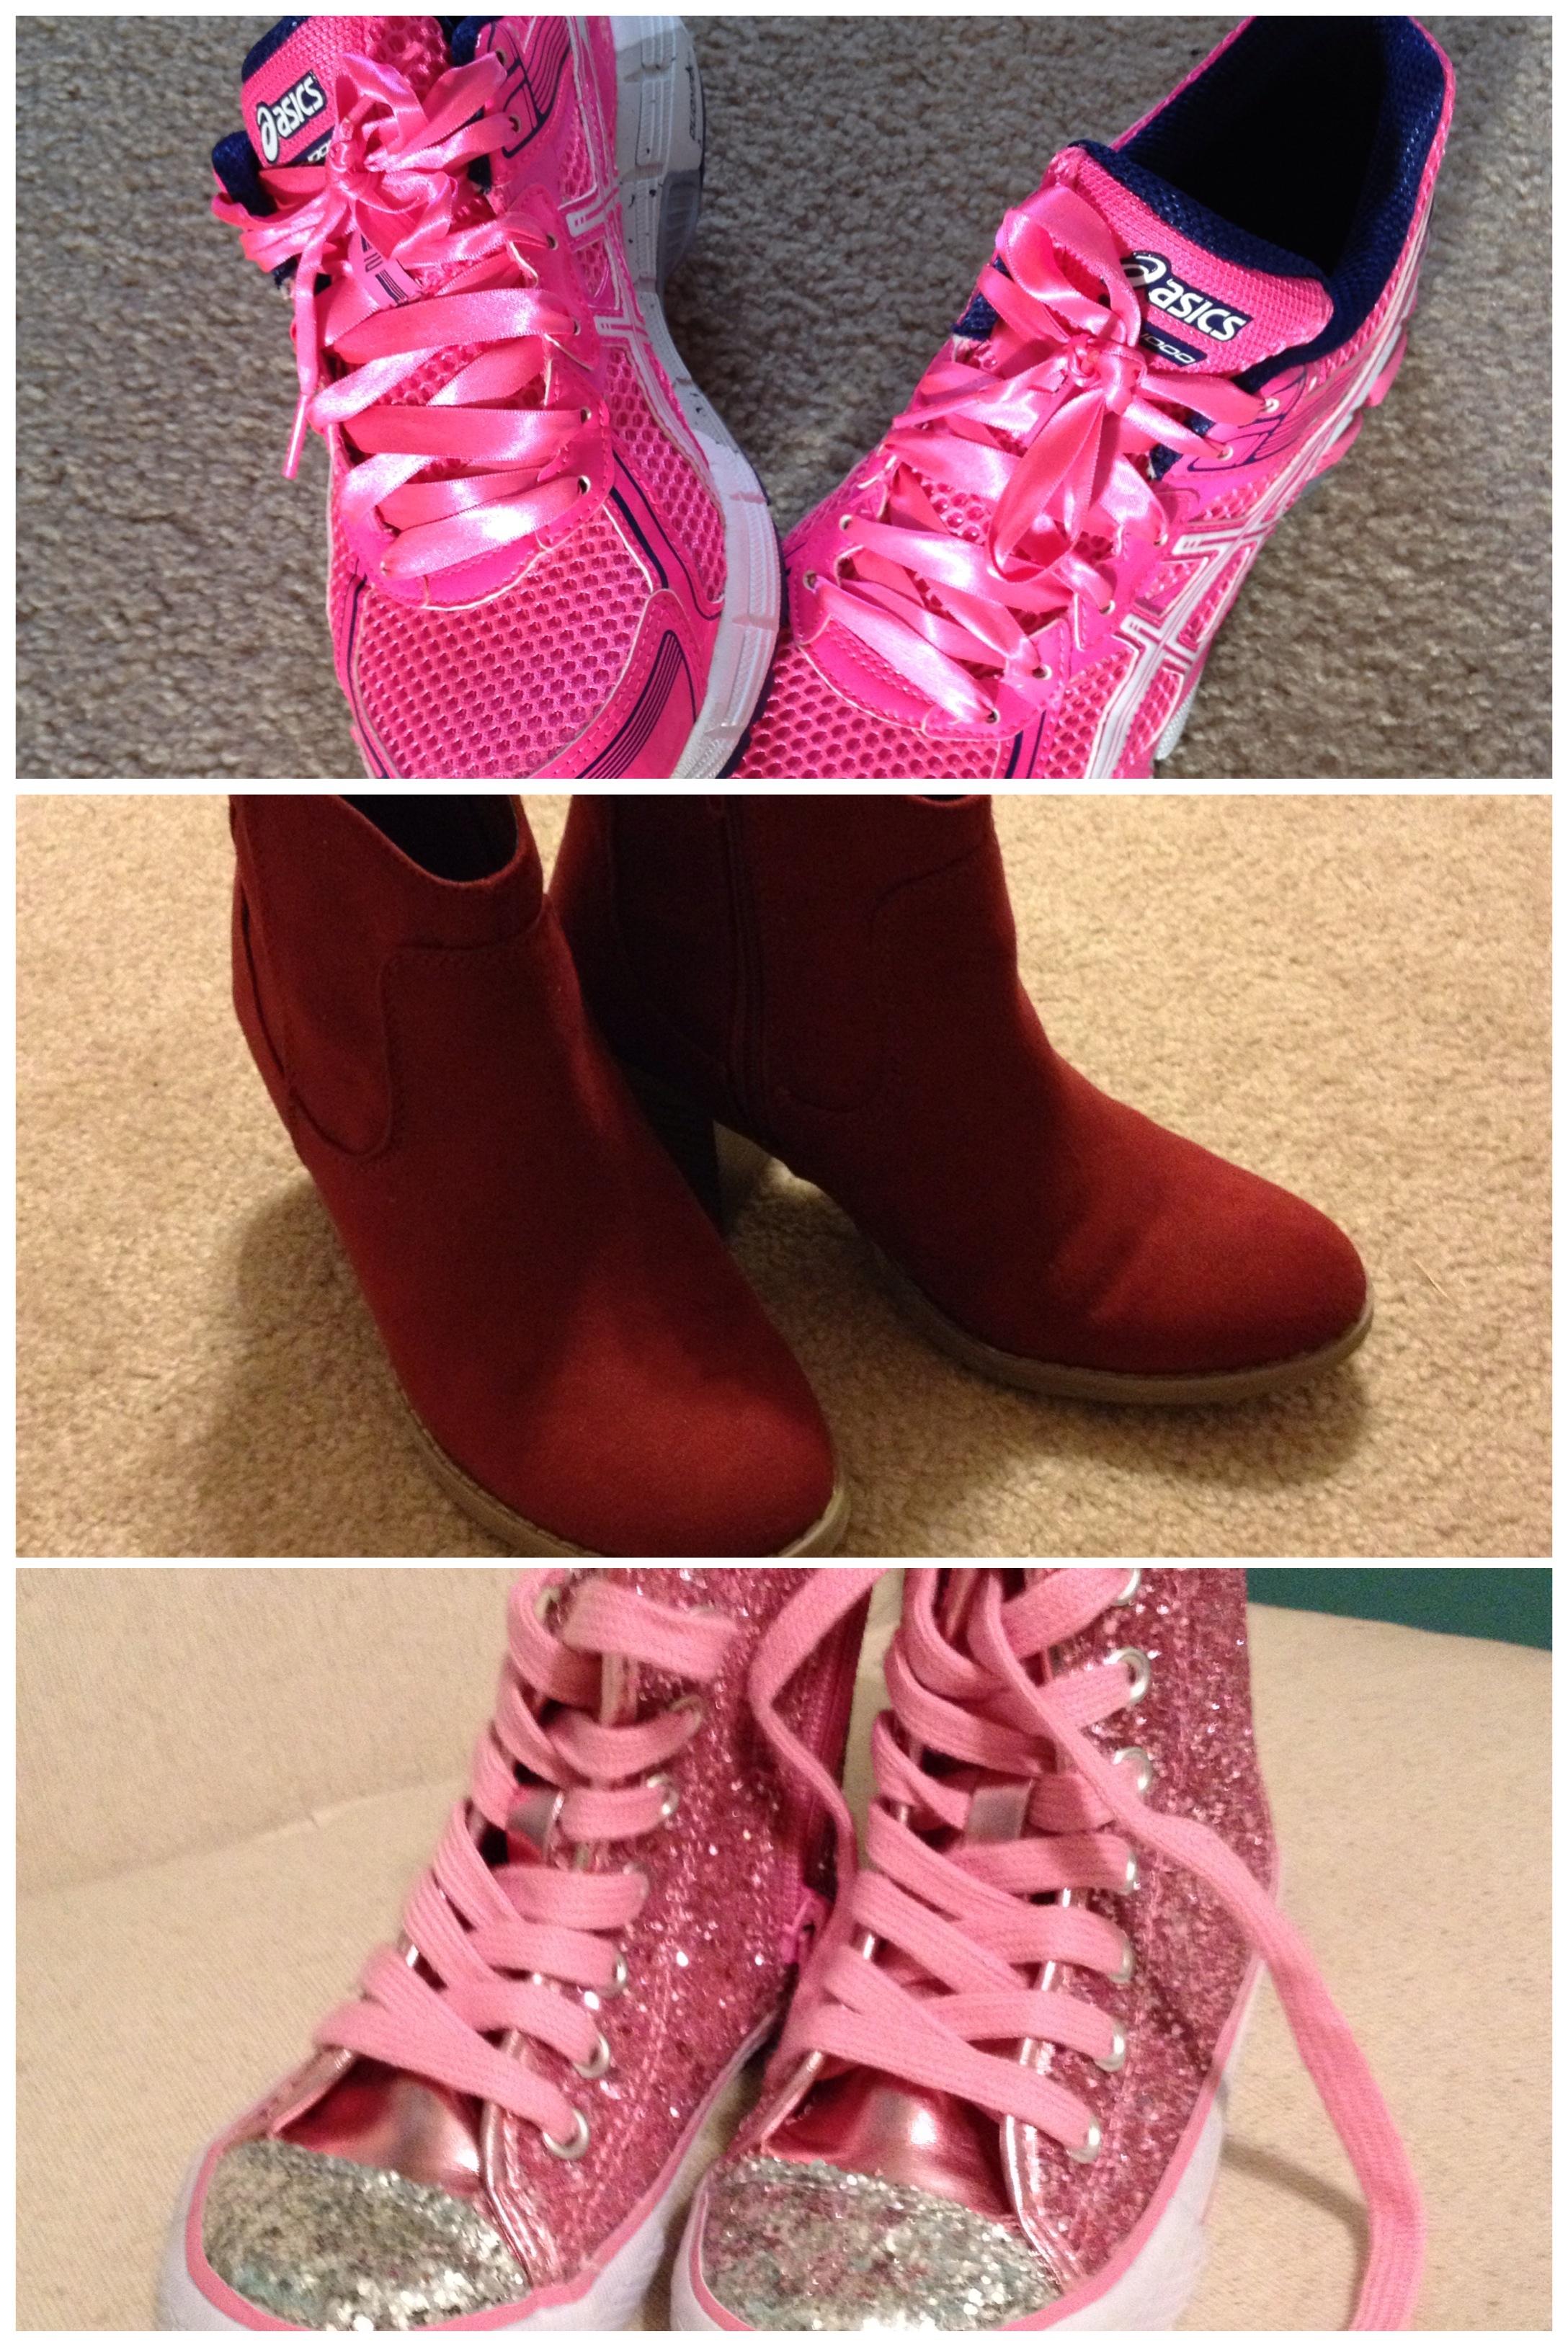 101913 shoes.JPG